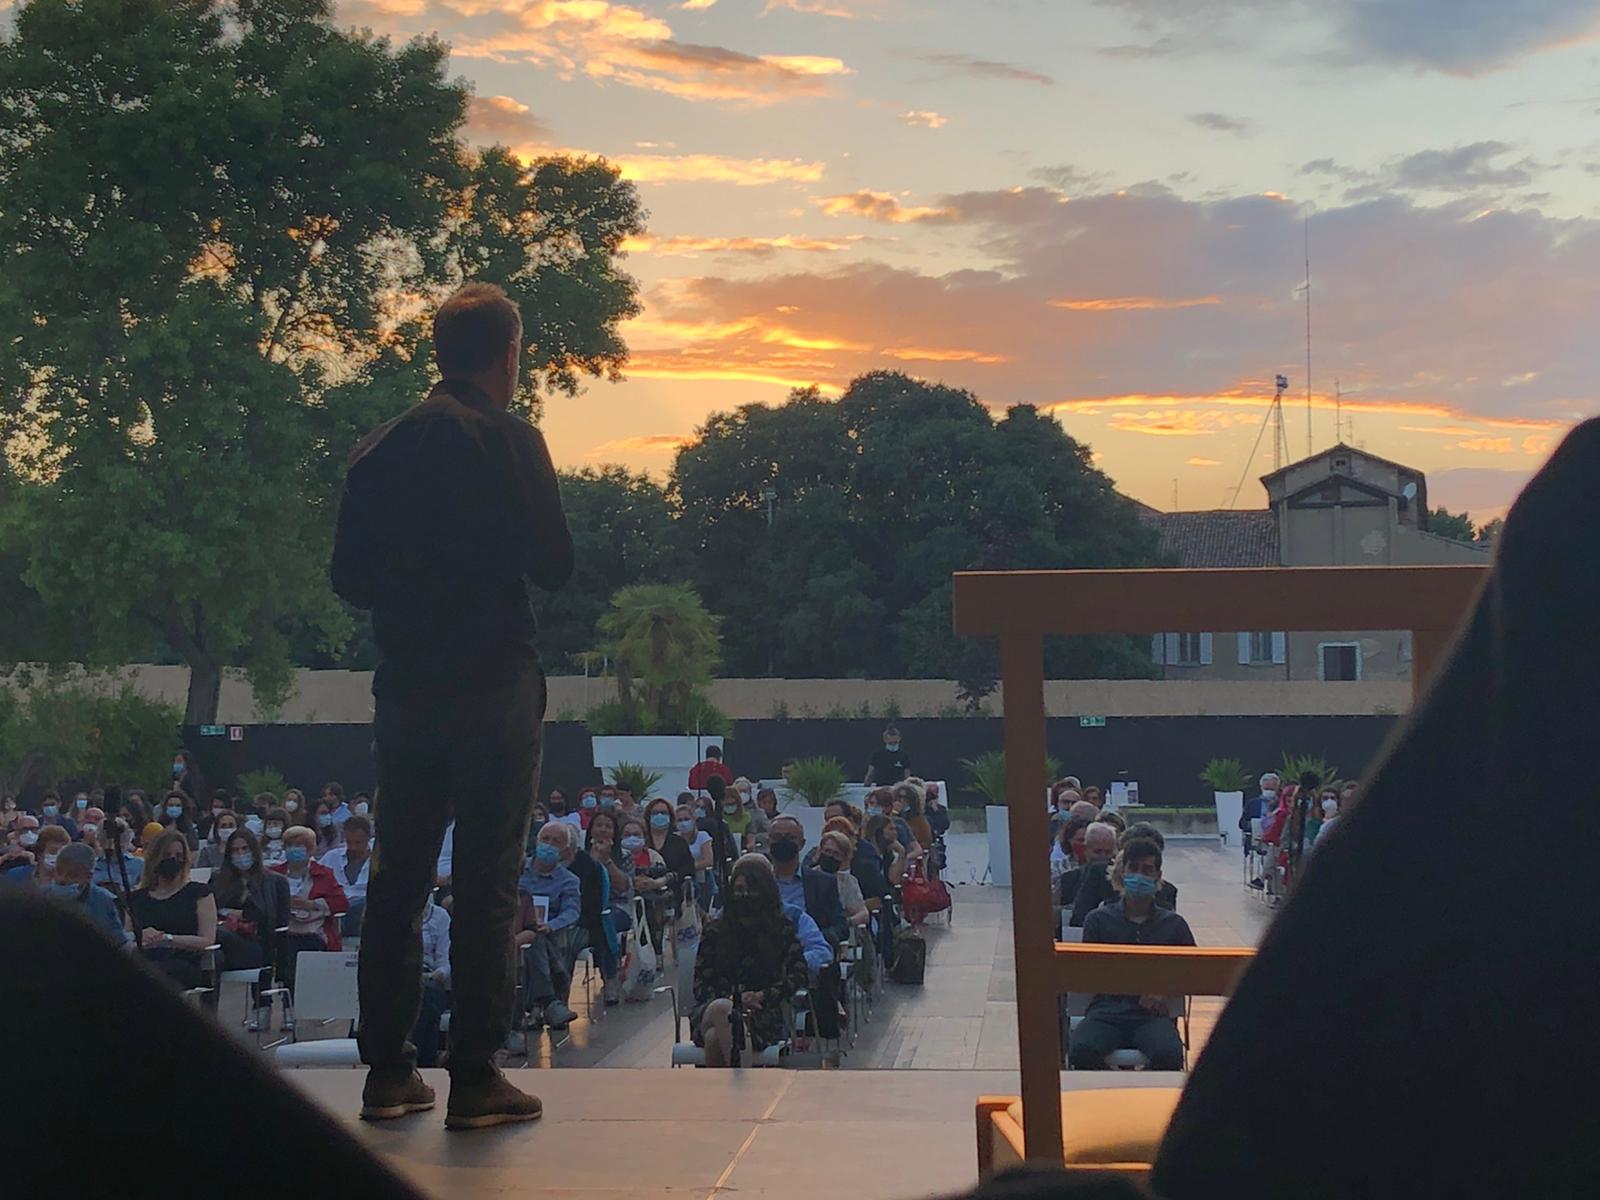 Festival Caterina di Forlì Accento di libertà